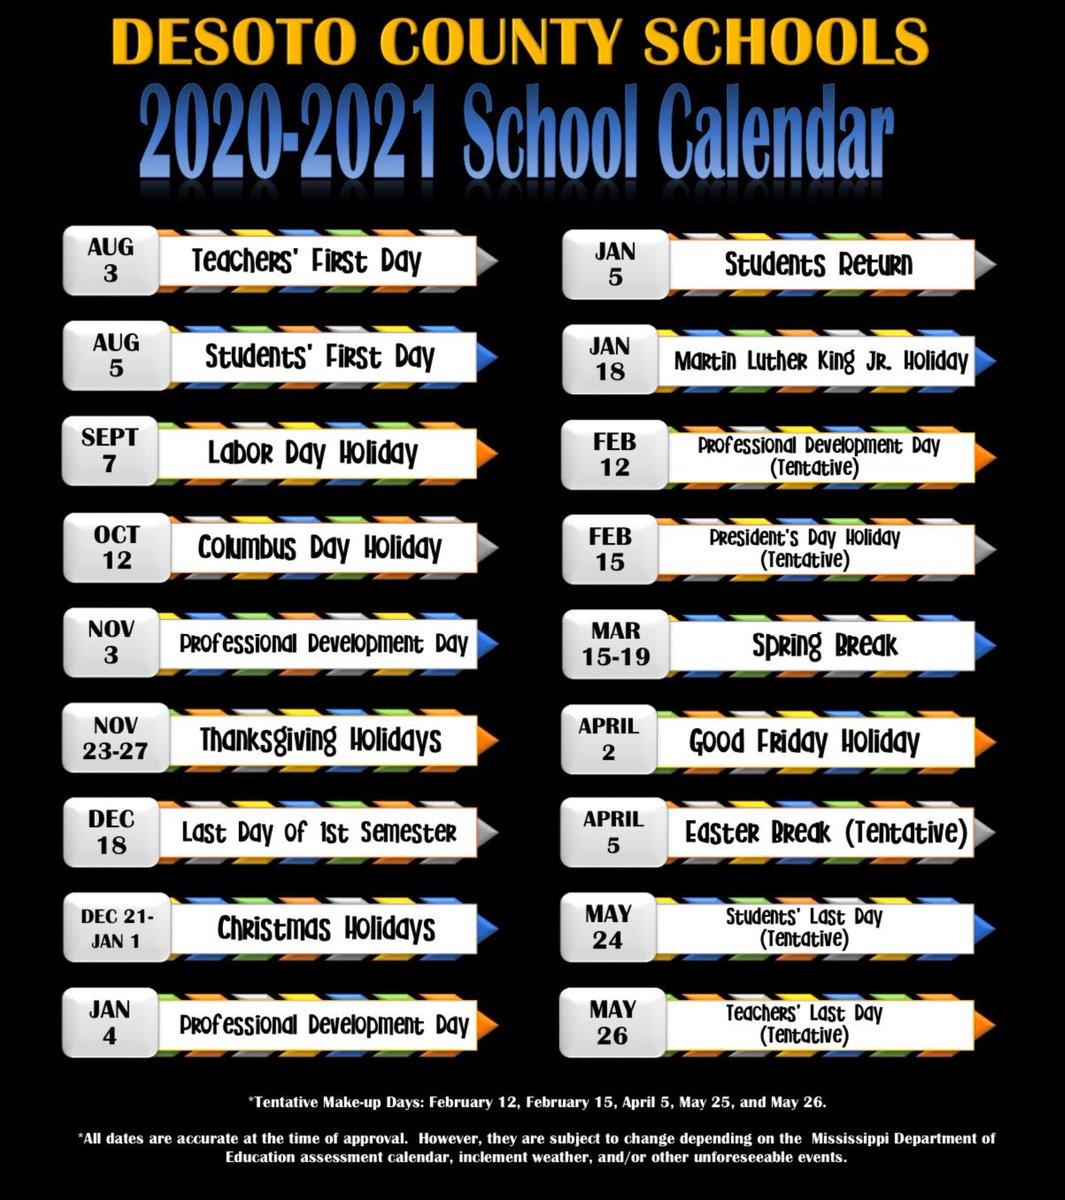 2020 Christmas Break Desoto County Schools Gayle Whiteside (@GayleWhiteside)   Twitter